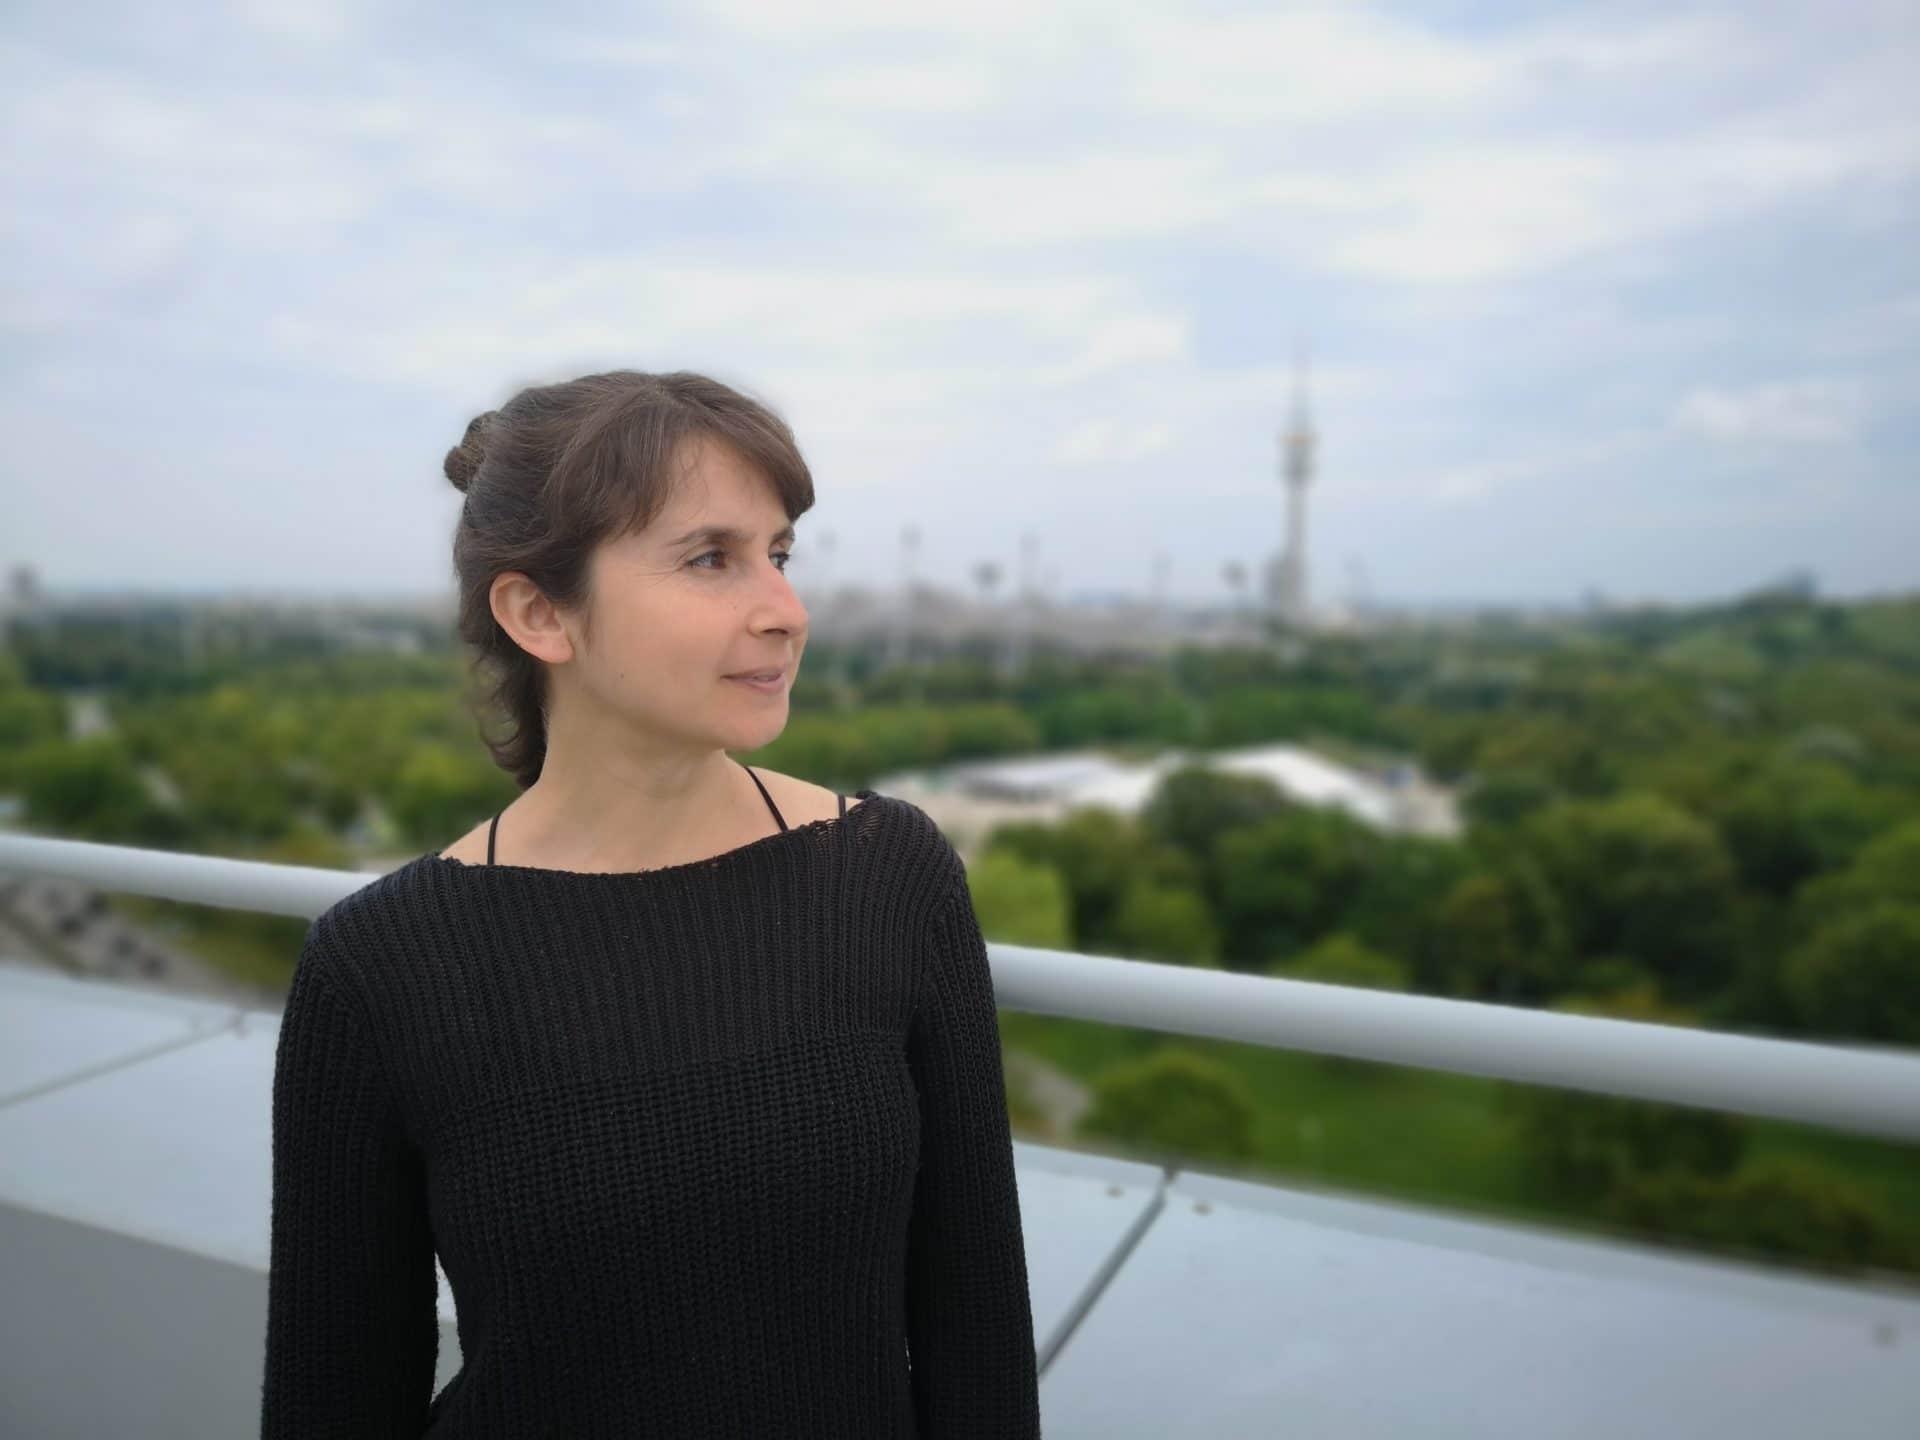 Machine Learning Engineer Asli Sabanci